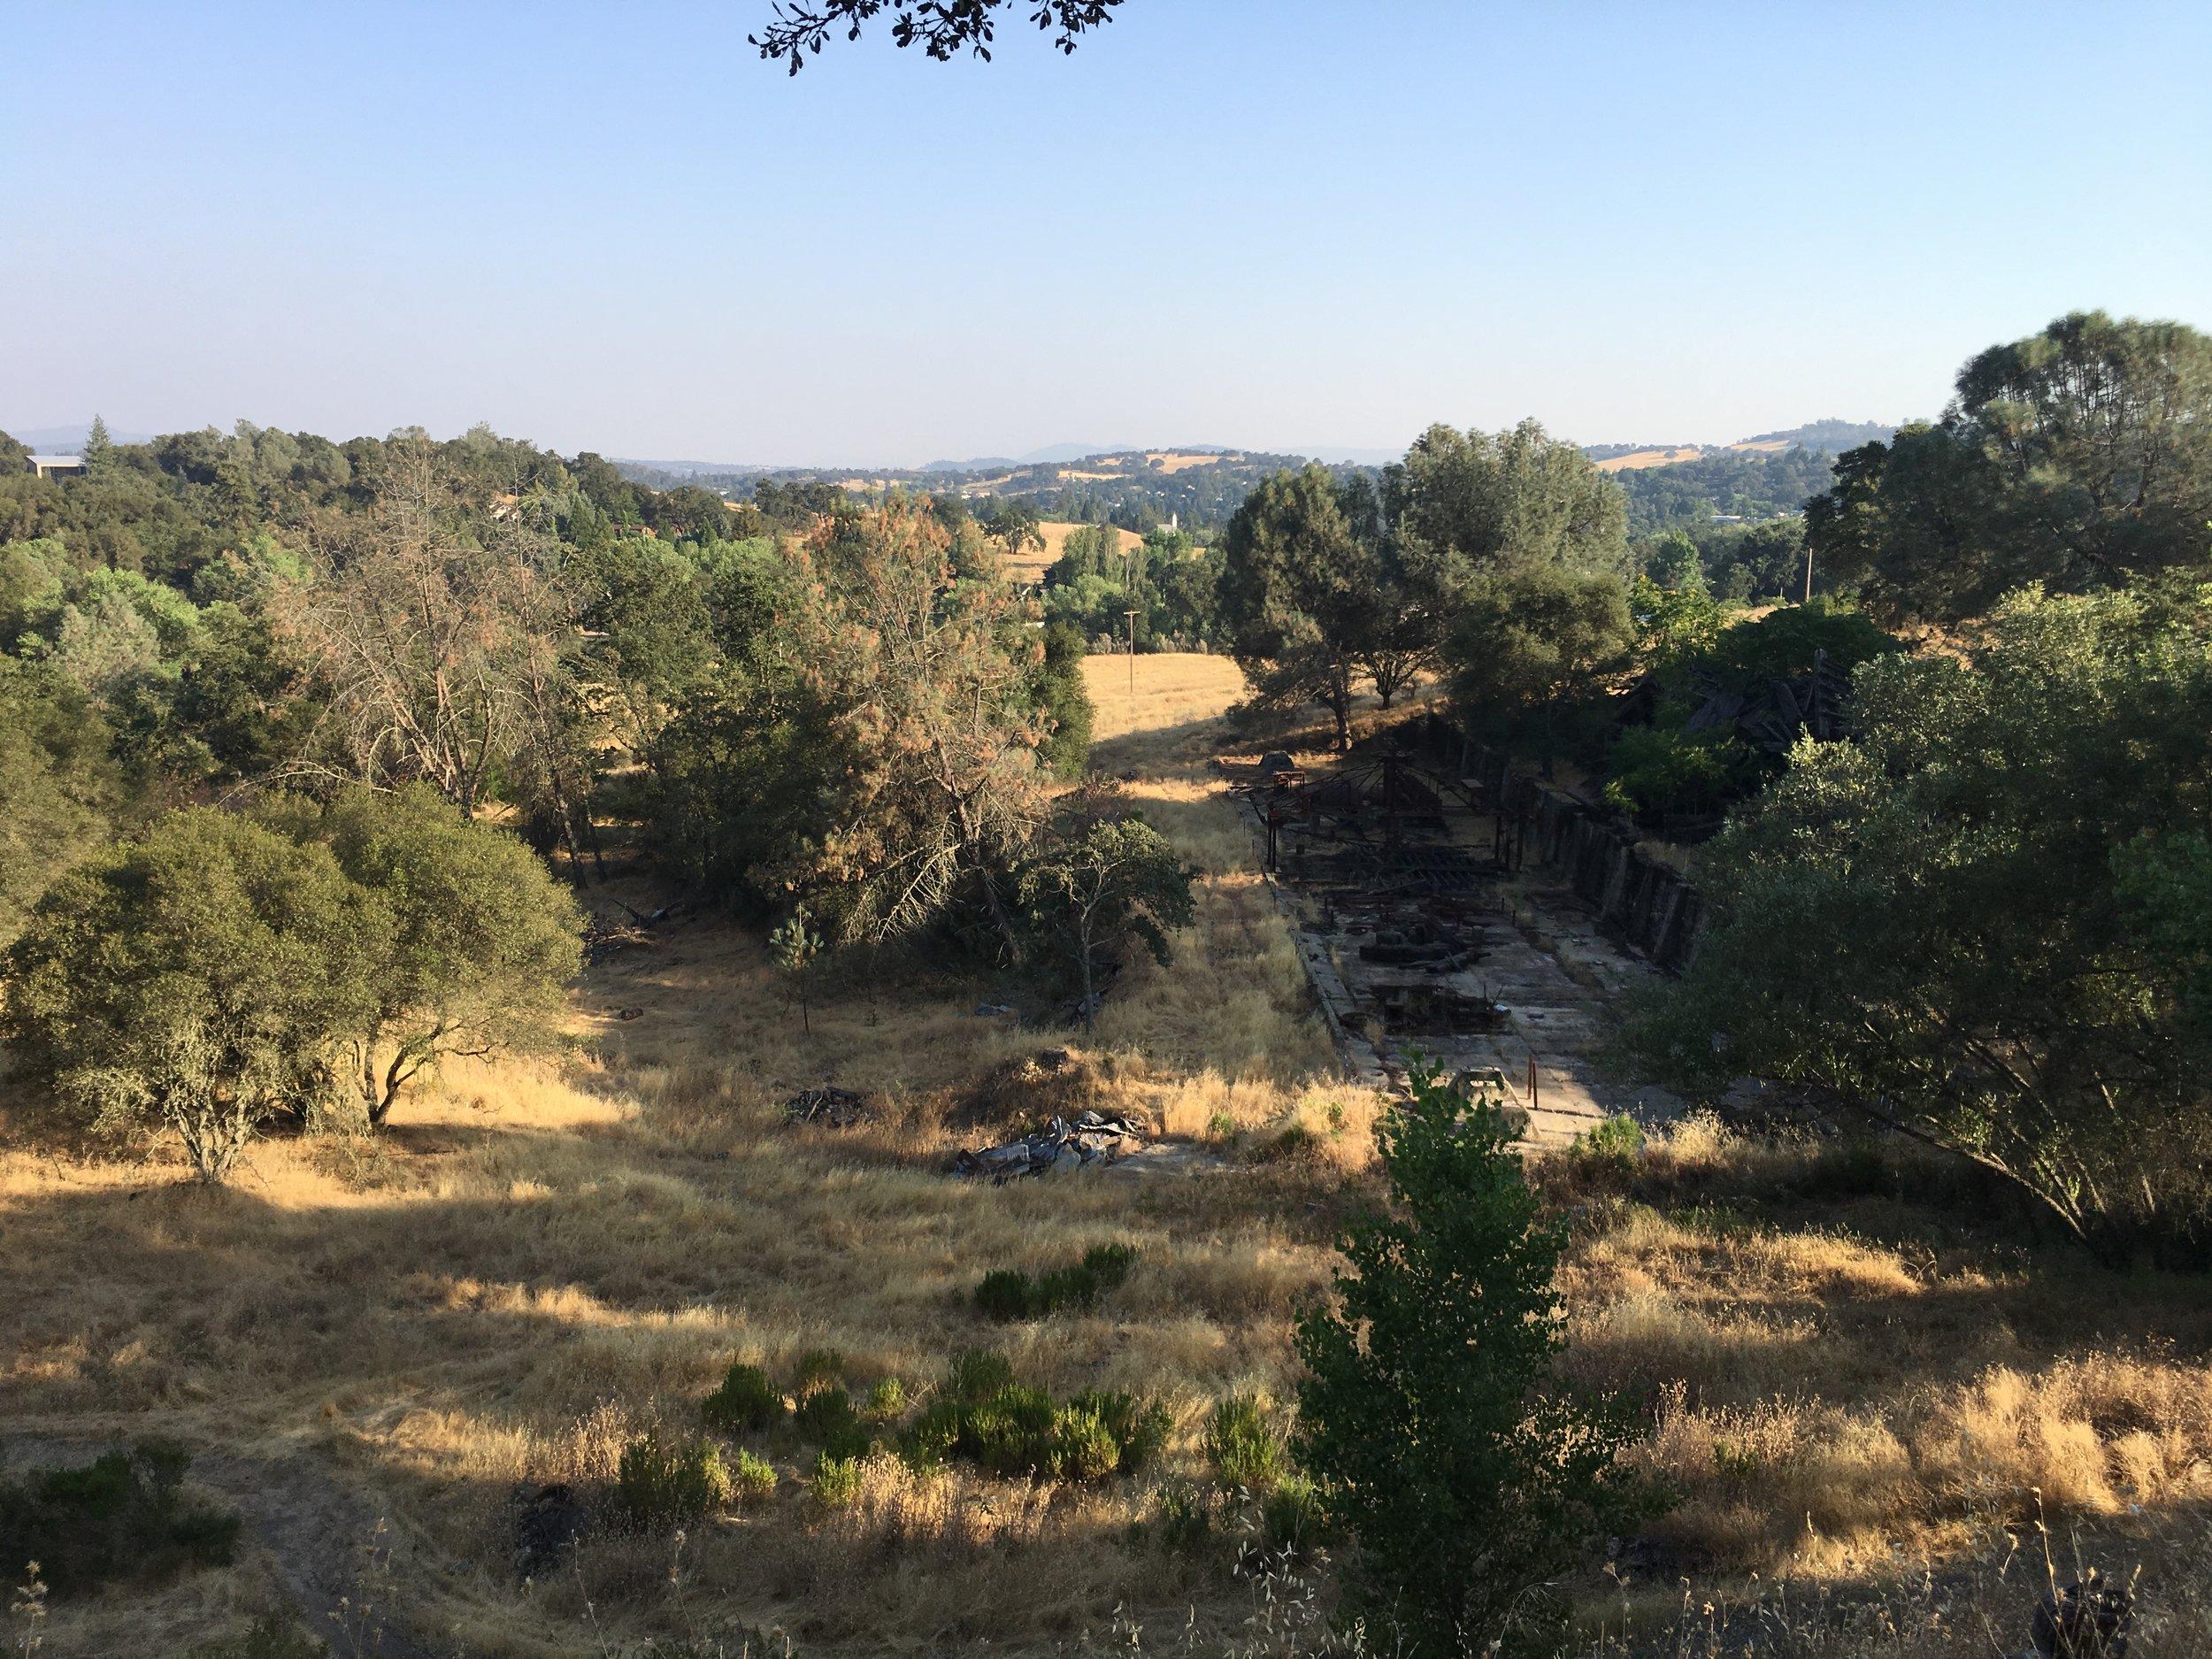 Amador County landscape